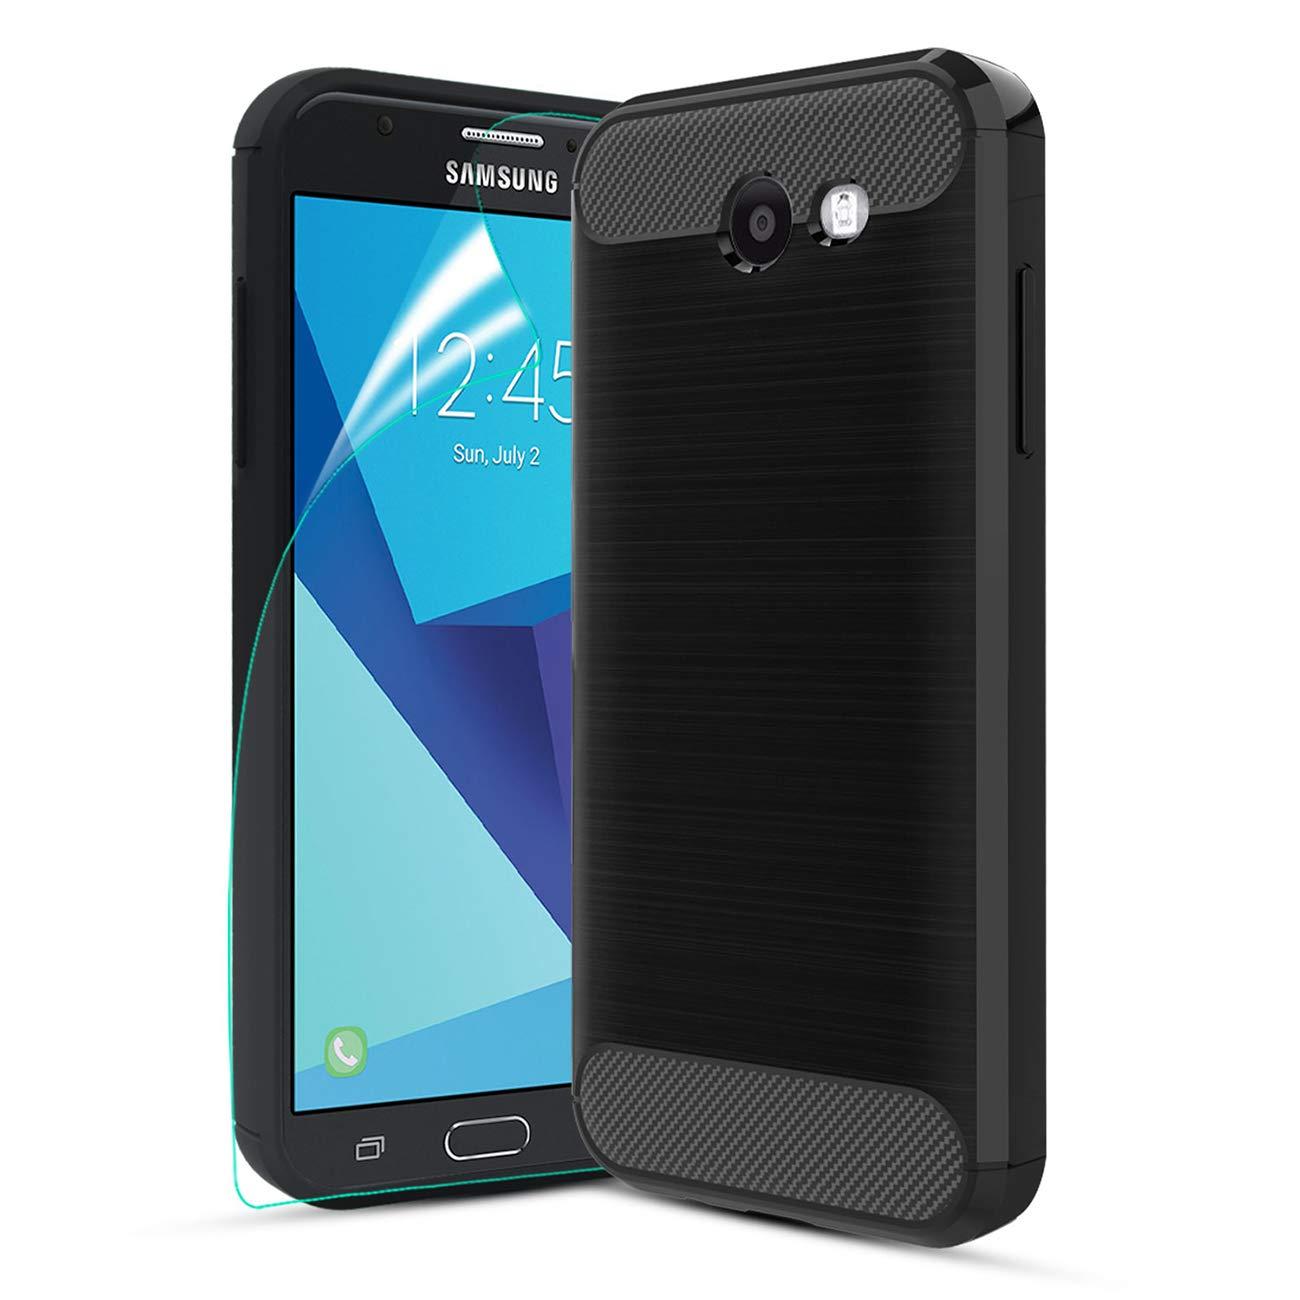 Samsung Galaxy J3 Emerge/J3 Prime/J3 Eclipse/J3 2017/J3 Luna Pro/Amp Prime 2/Express Prime 2 Case,CaseRoo Carbon Fiber Brushed Texture TPU Cover Case ...